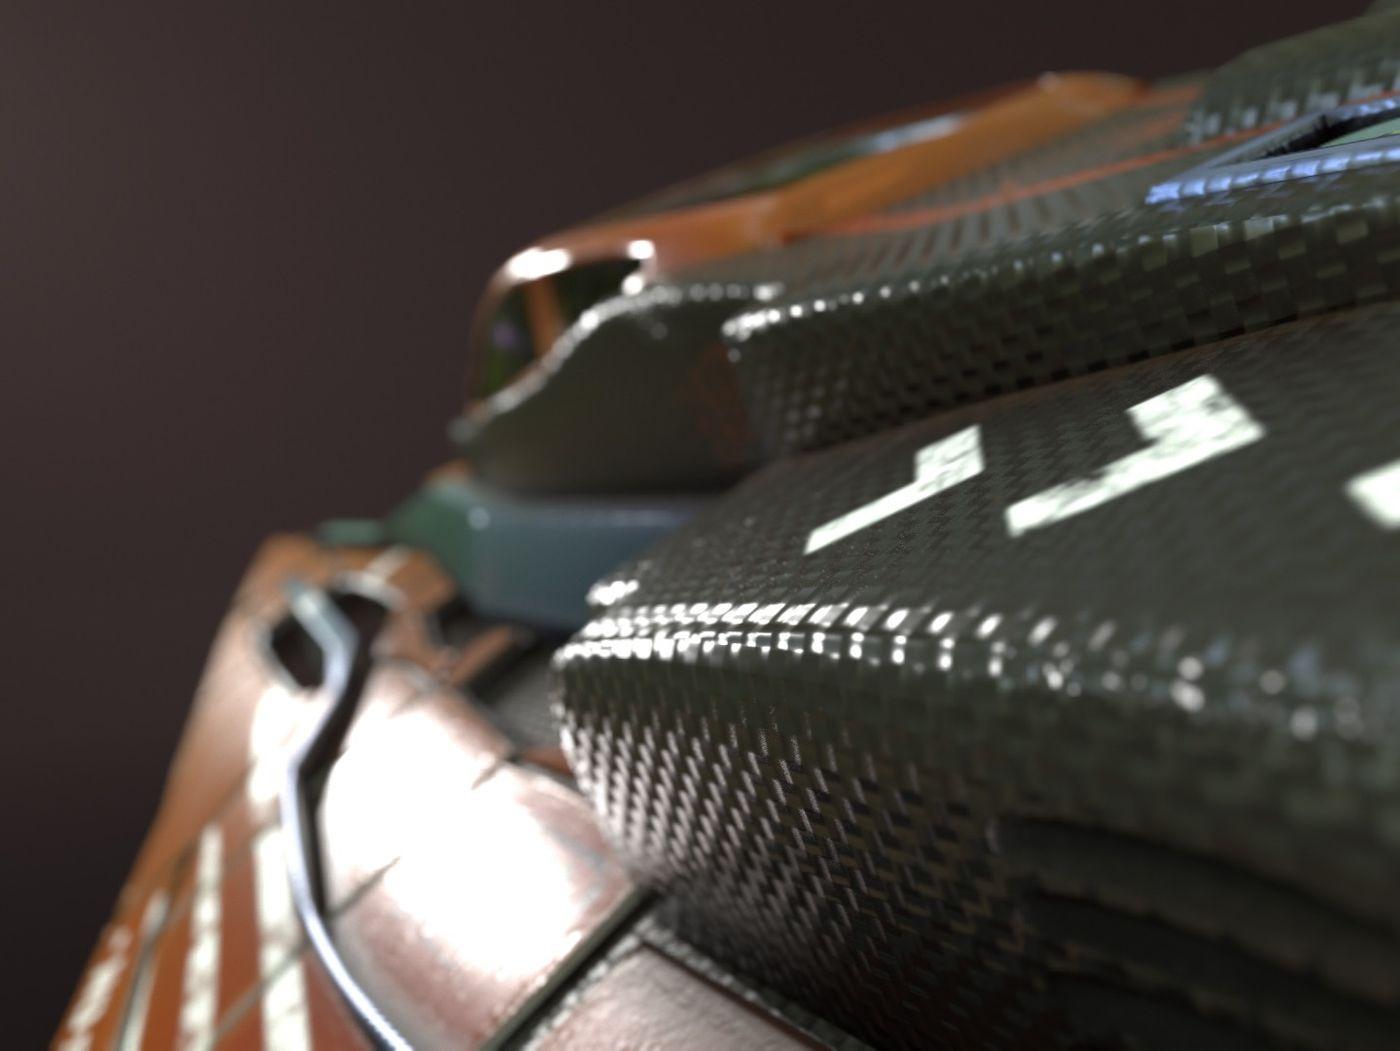 Race spaceship